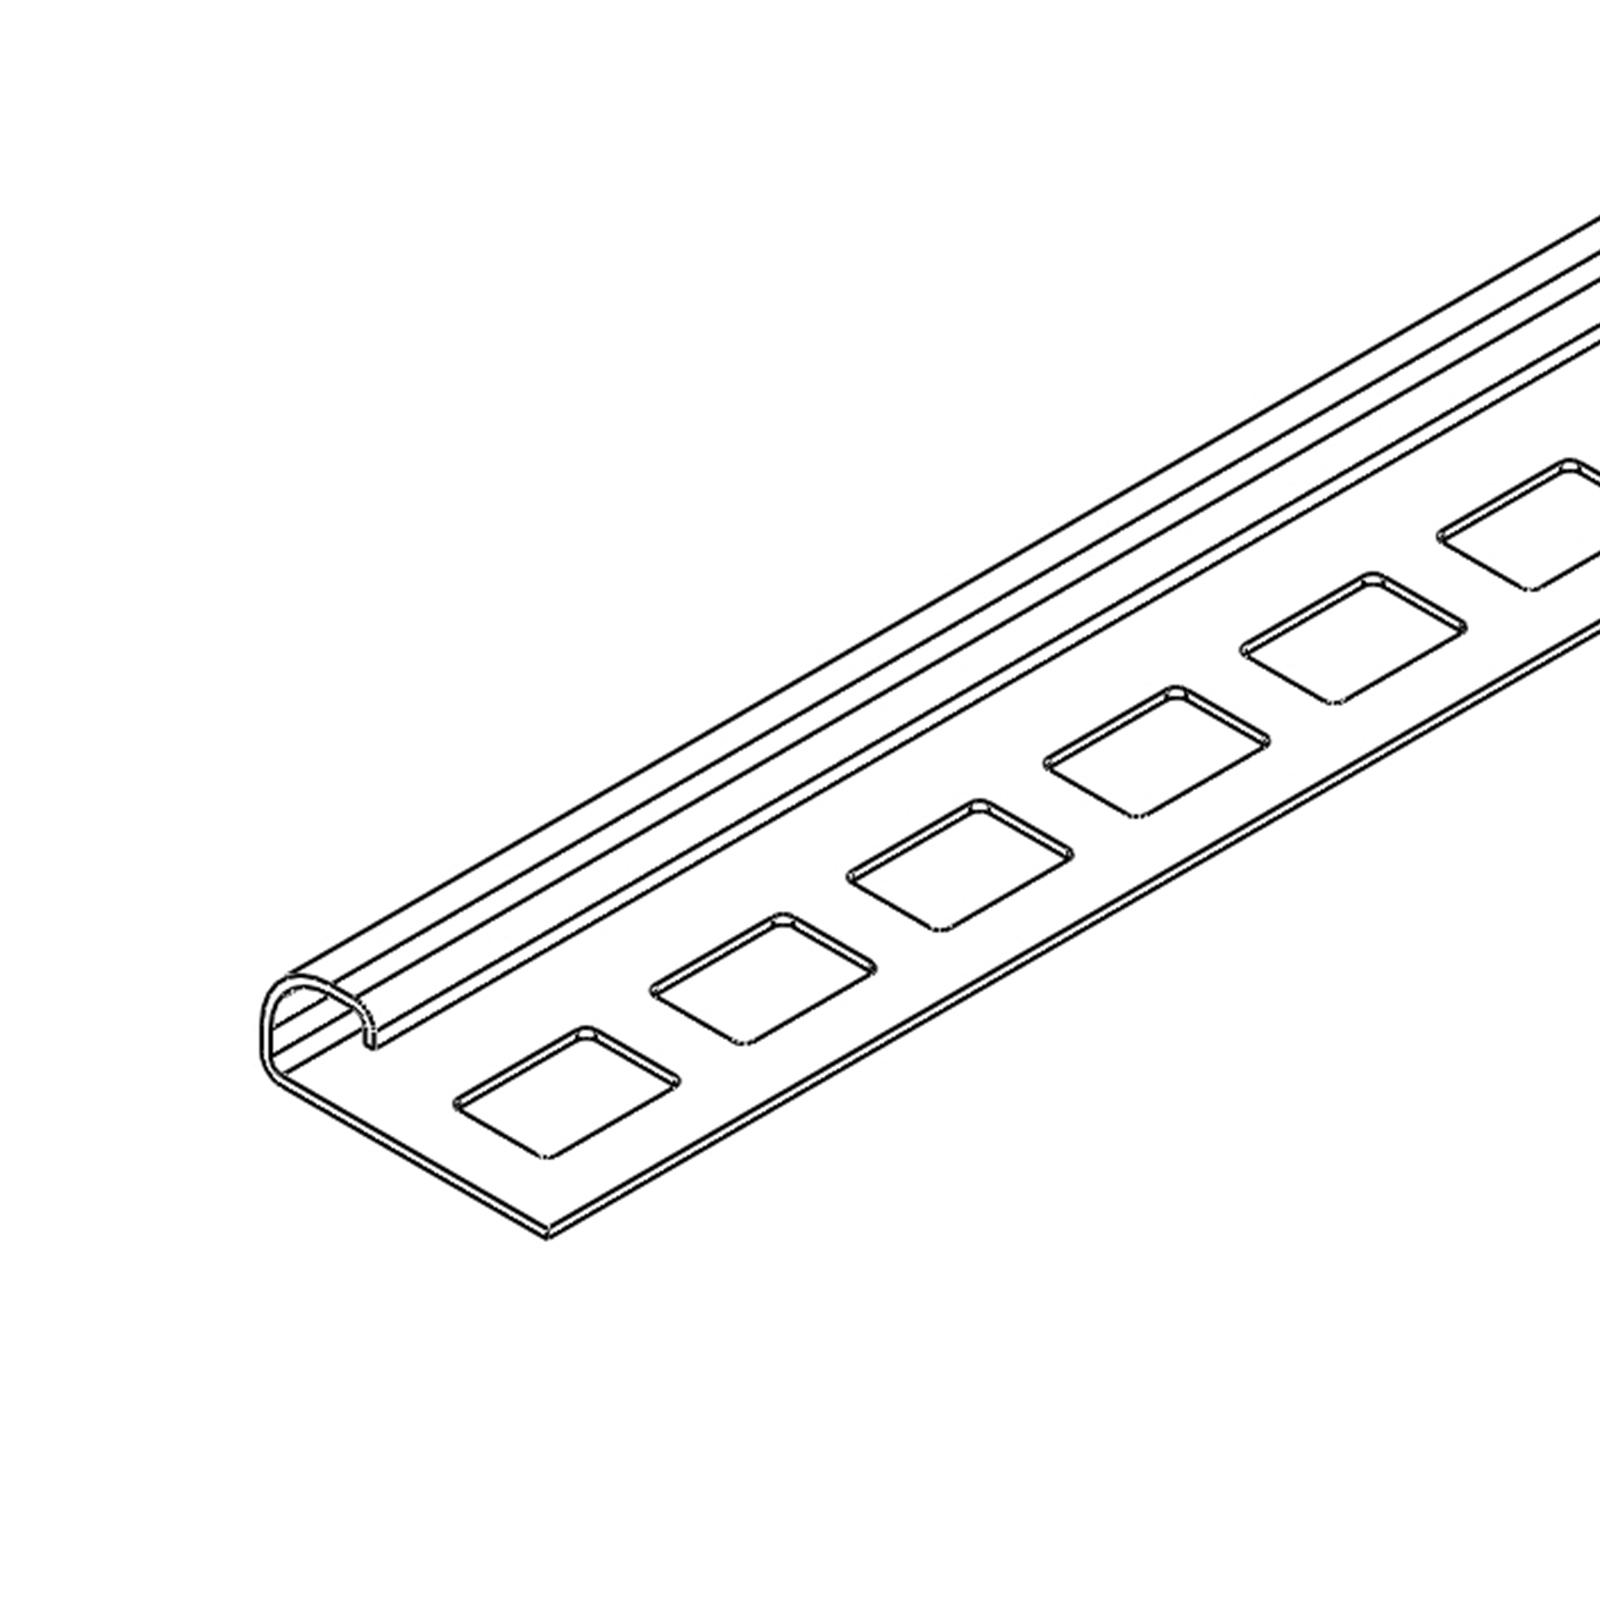 8 mm I gl/änzend HORI/® Au/ßen-// Innenecke f/ür Fliesenprofil I Zubeh/ör f/ür Quadroprofil aus Edelstahl I H/öhe